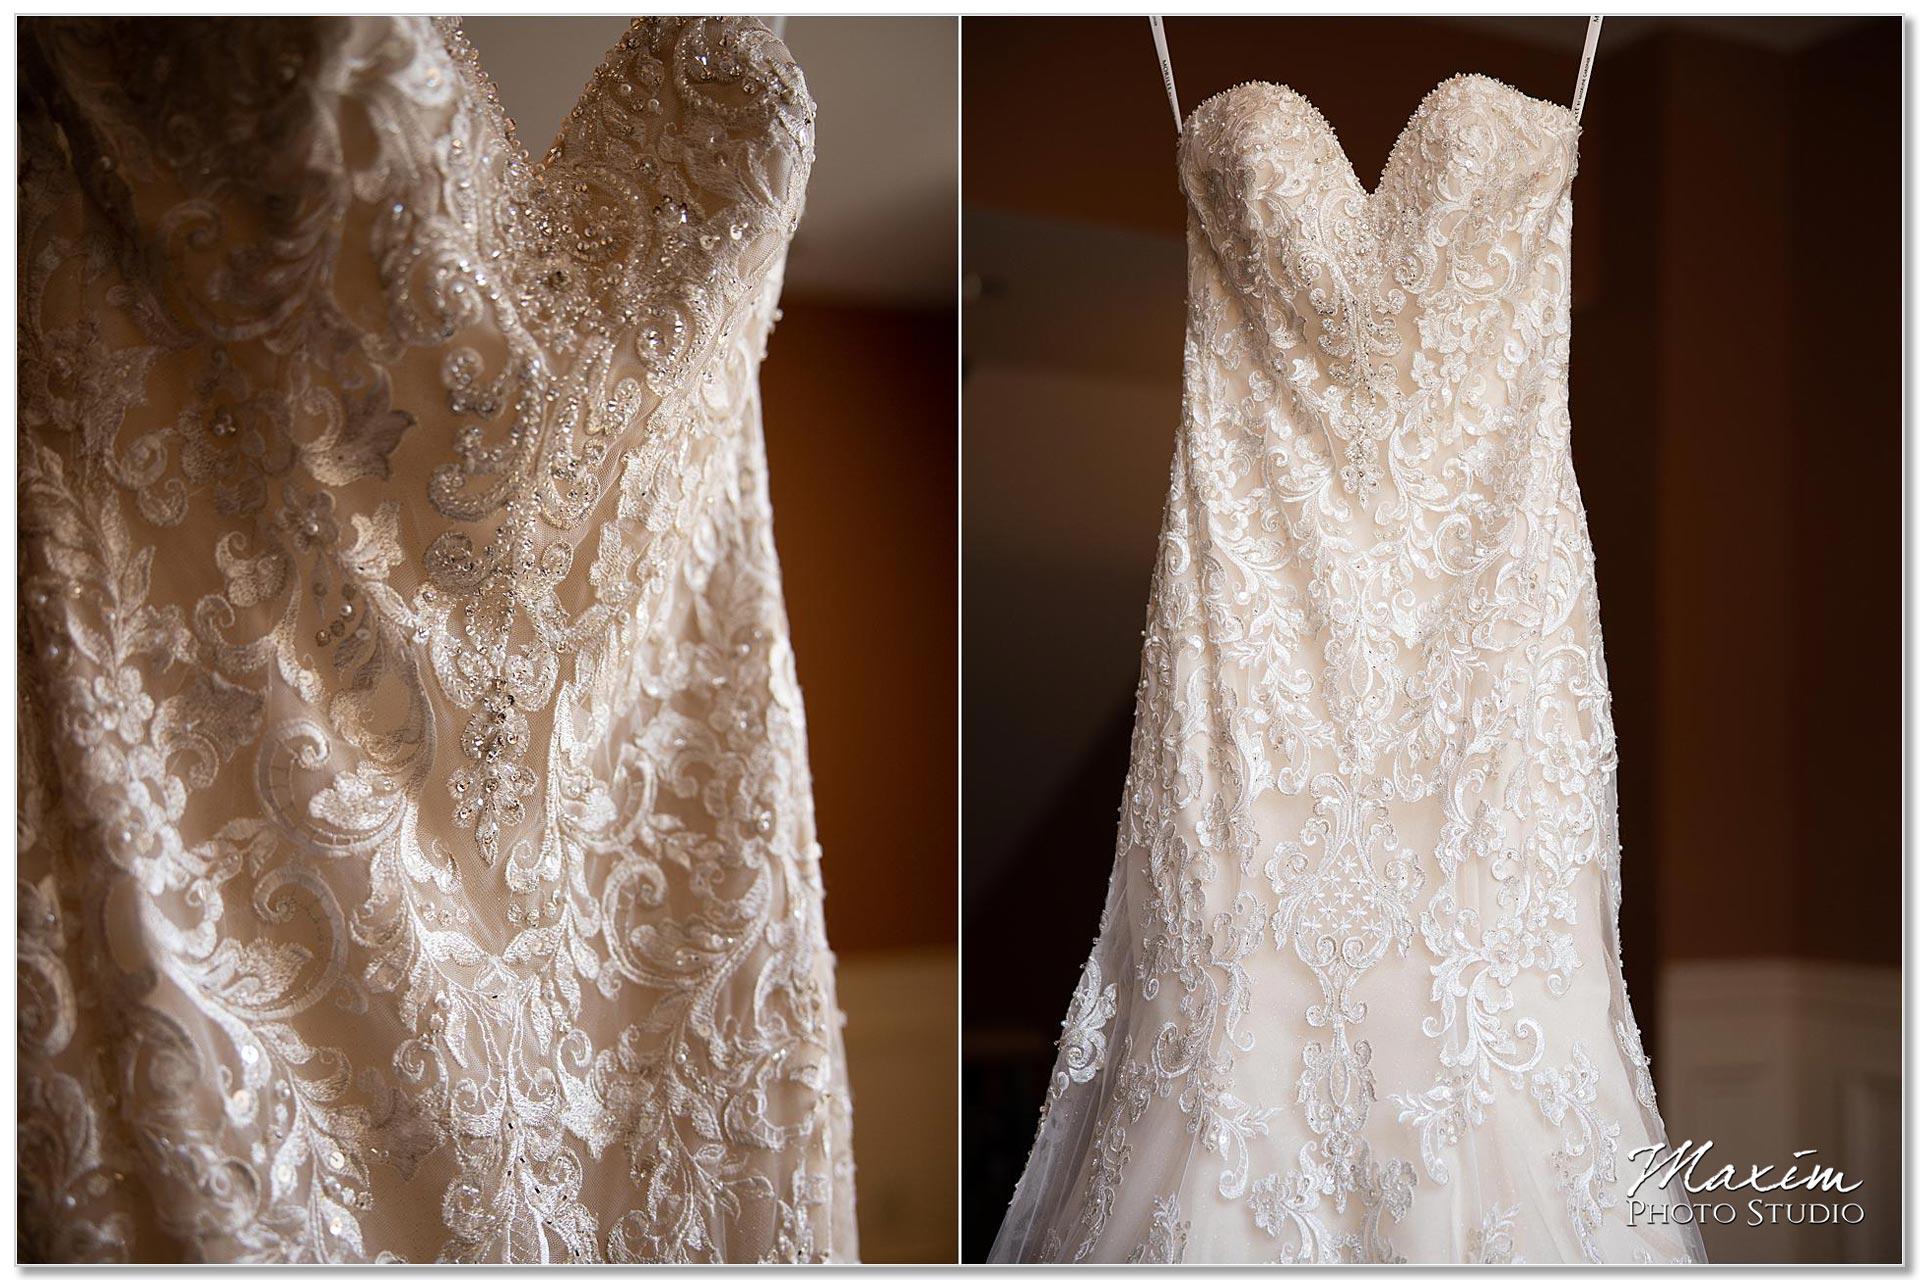 Bridal and Formal Wedding Dress